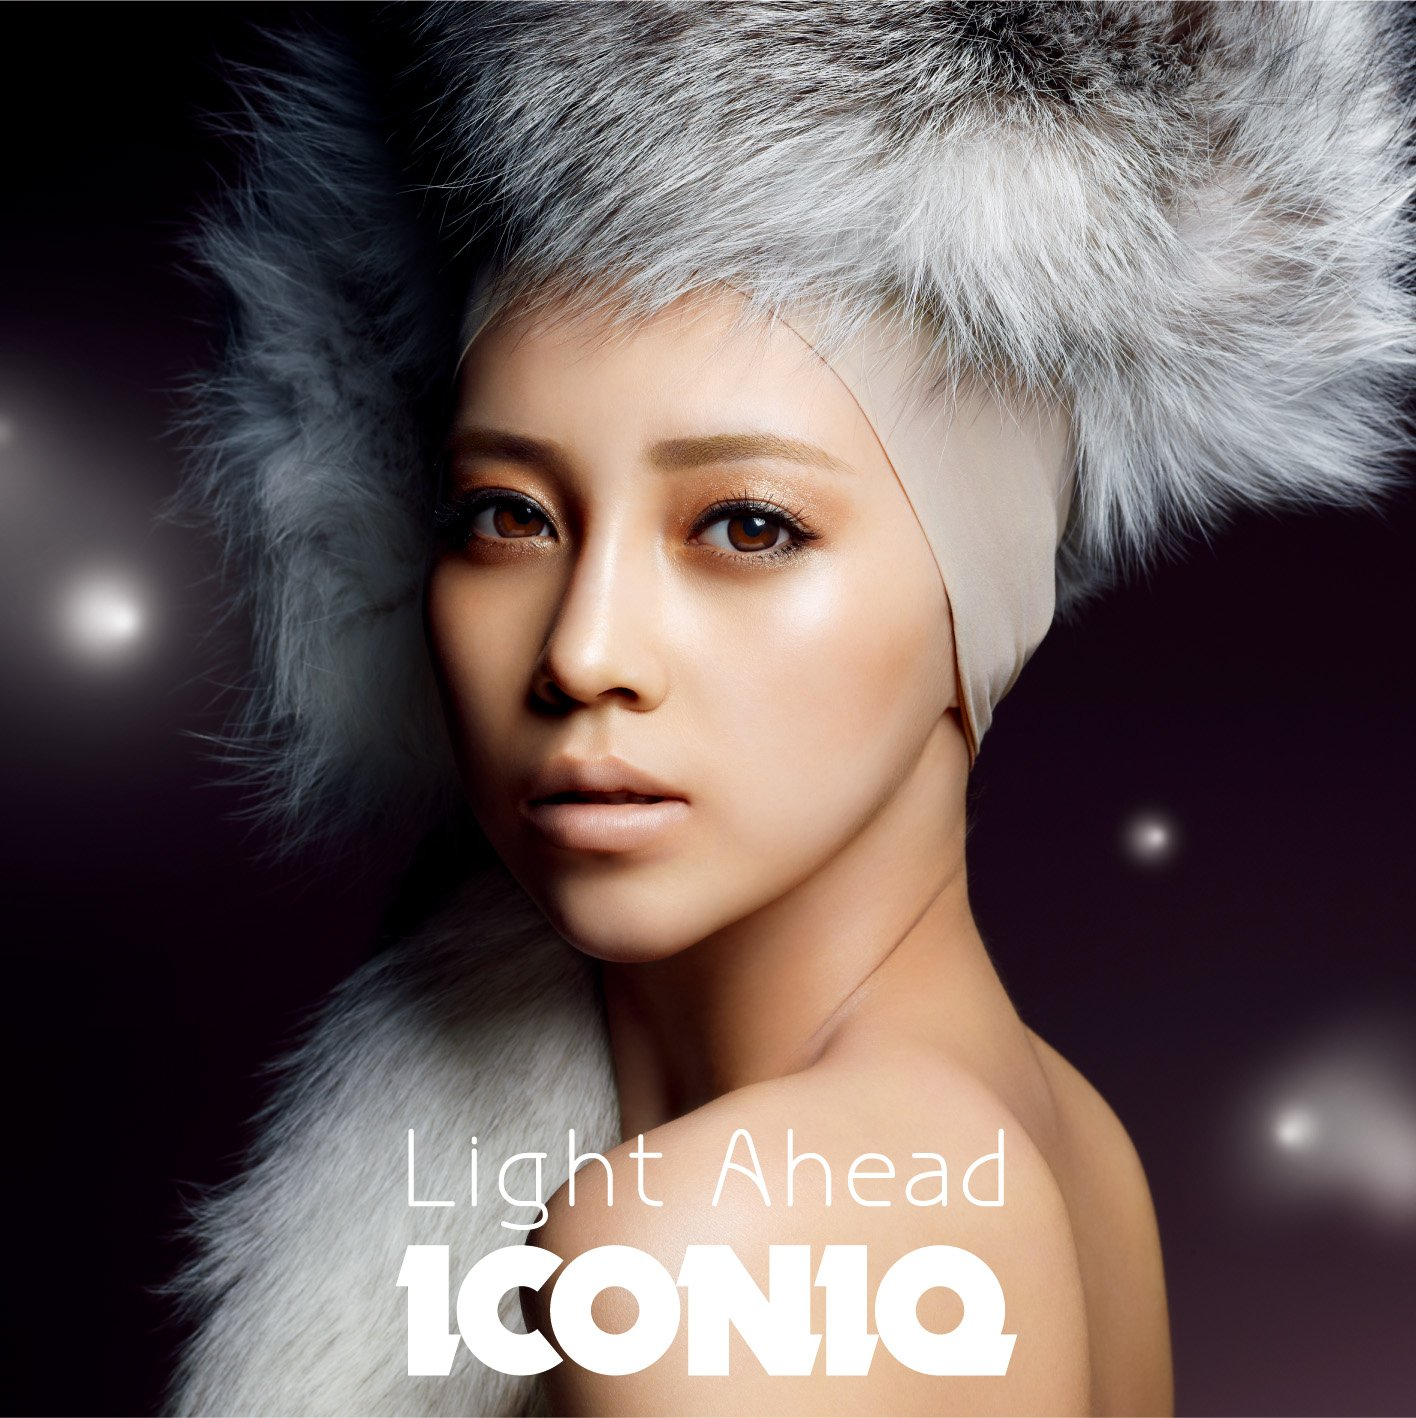 20180301.2201.06 ICONIQ - Light Ahead (FLAC) cover 1.jpg